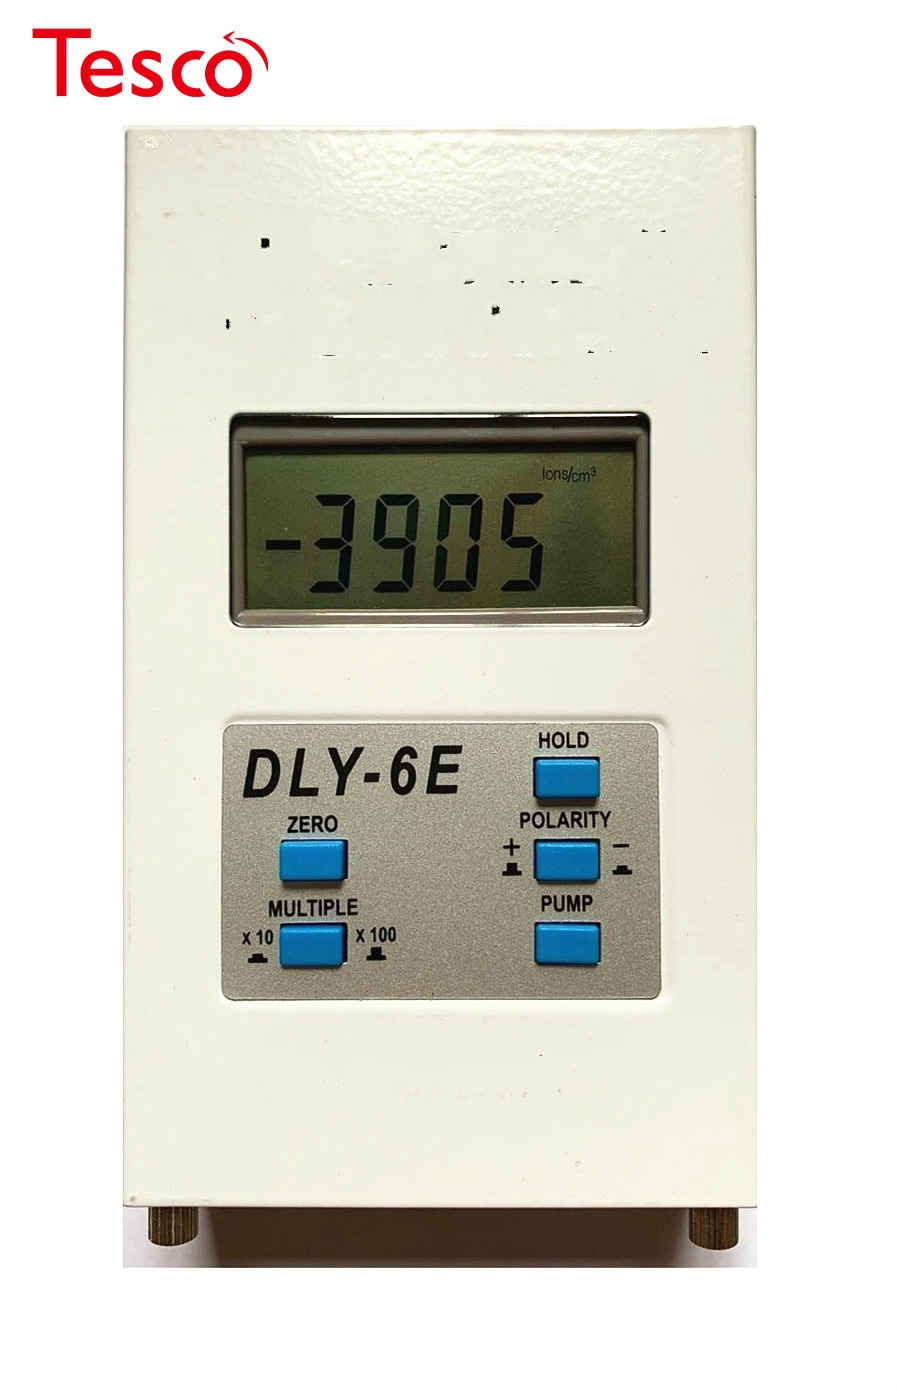 DLY-6E الهواء أيون مكافحة قياس المدى 10 إلى 399990 أيونات/cm3